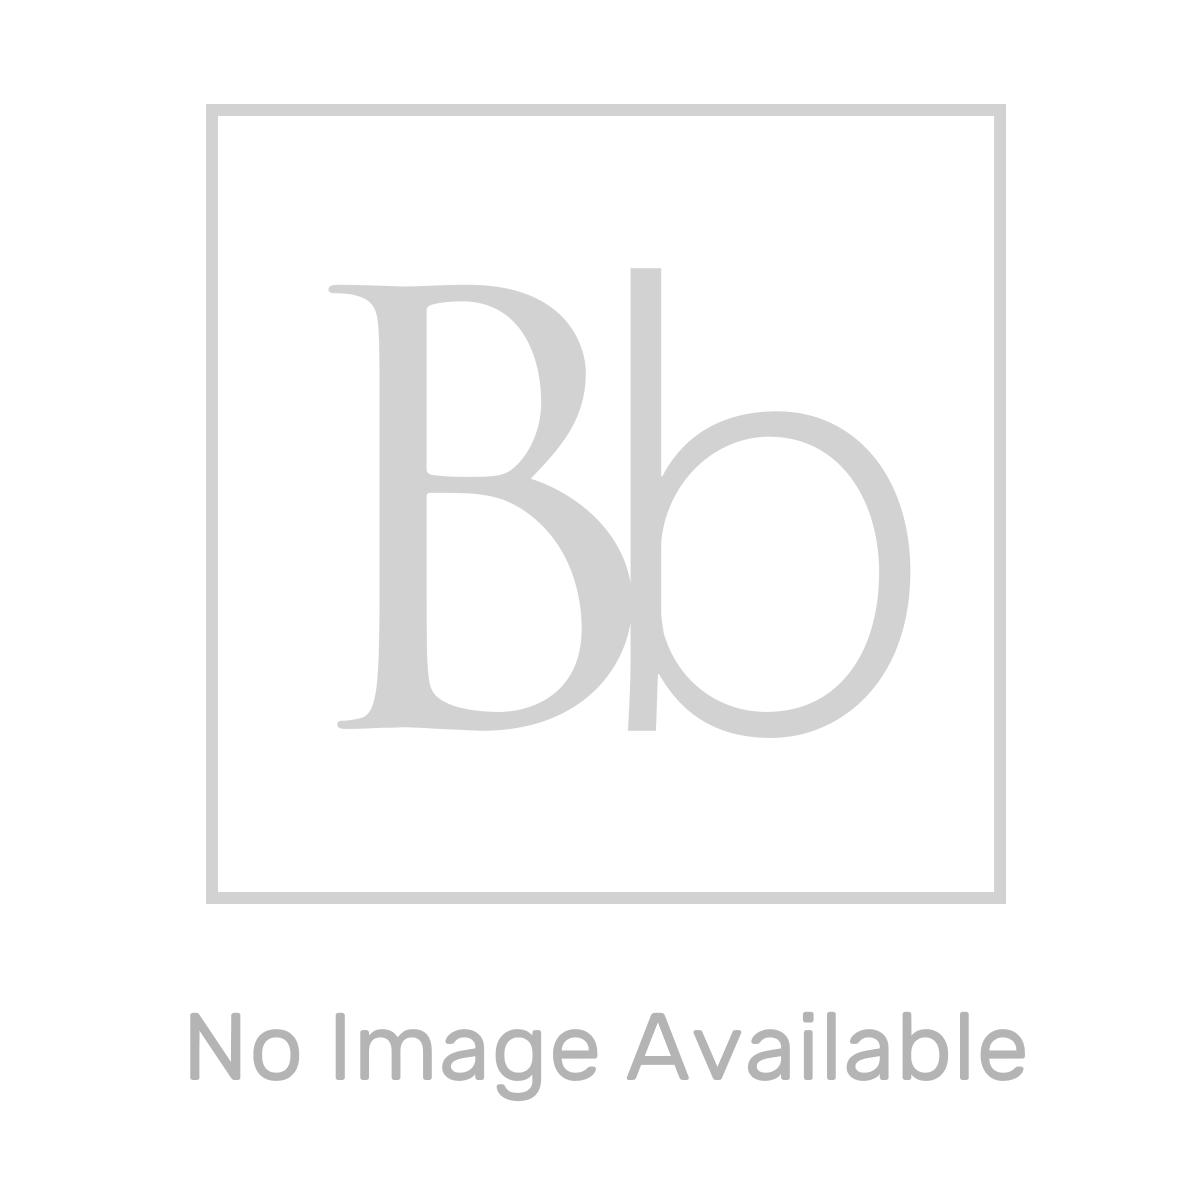 Aquadart Black Slate Shower Tray 1700 x 760 Lifestyle